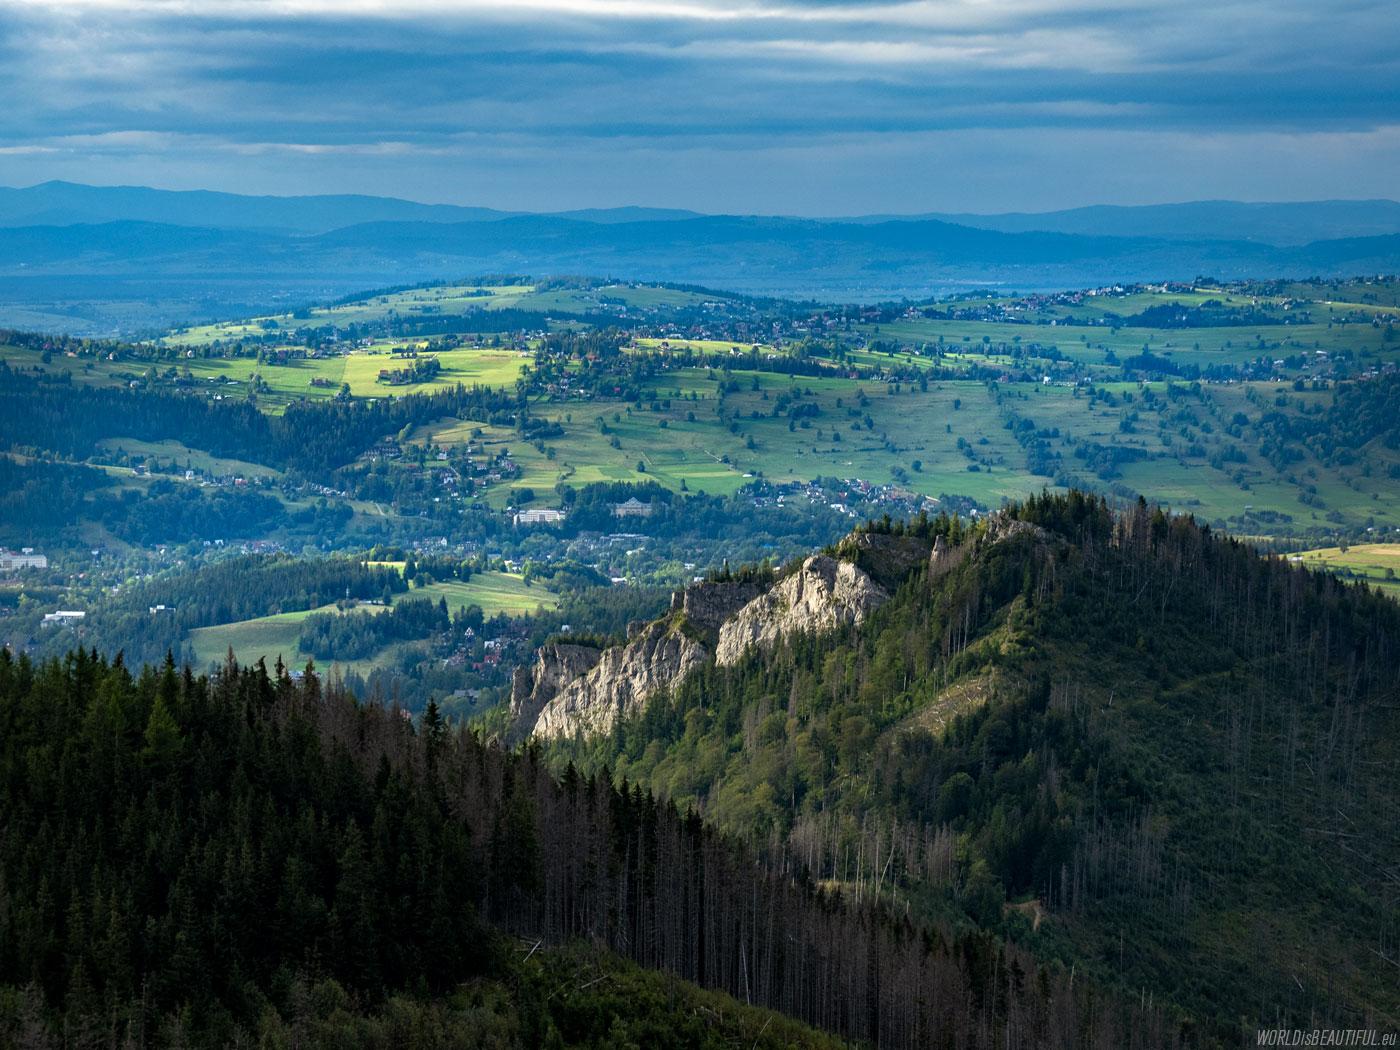 Nosal - mountain landscape